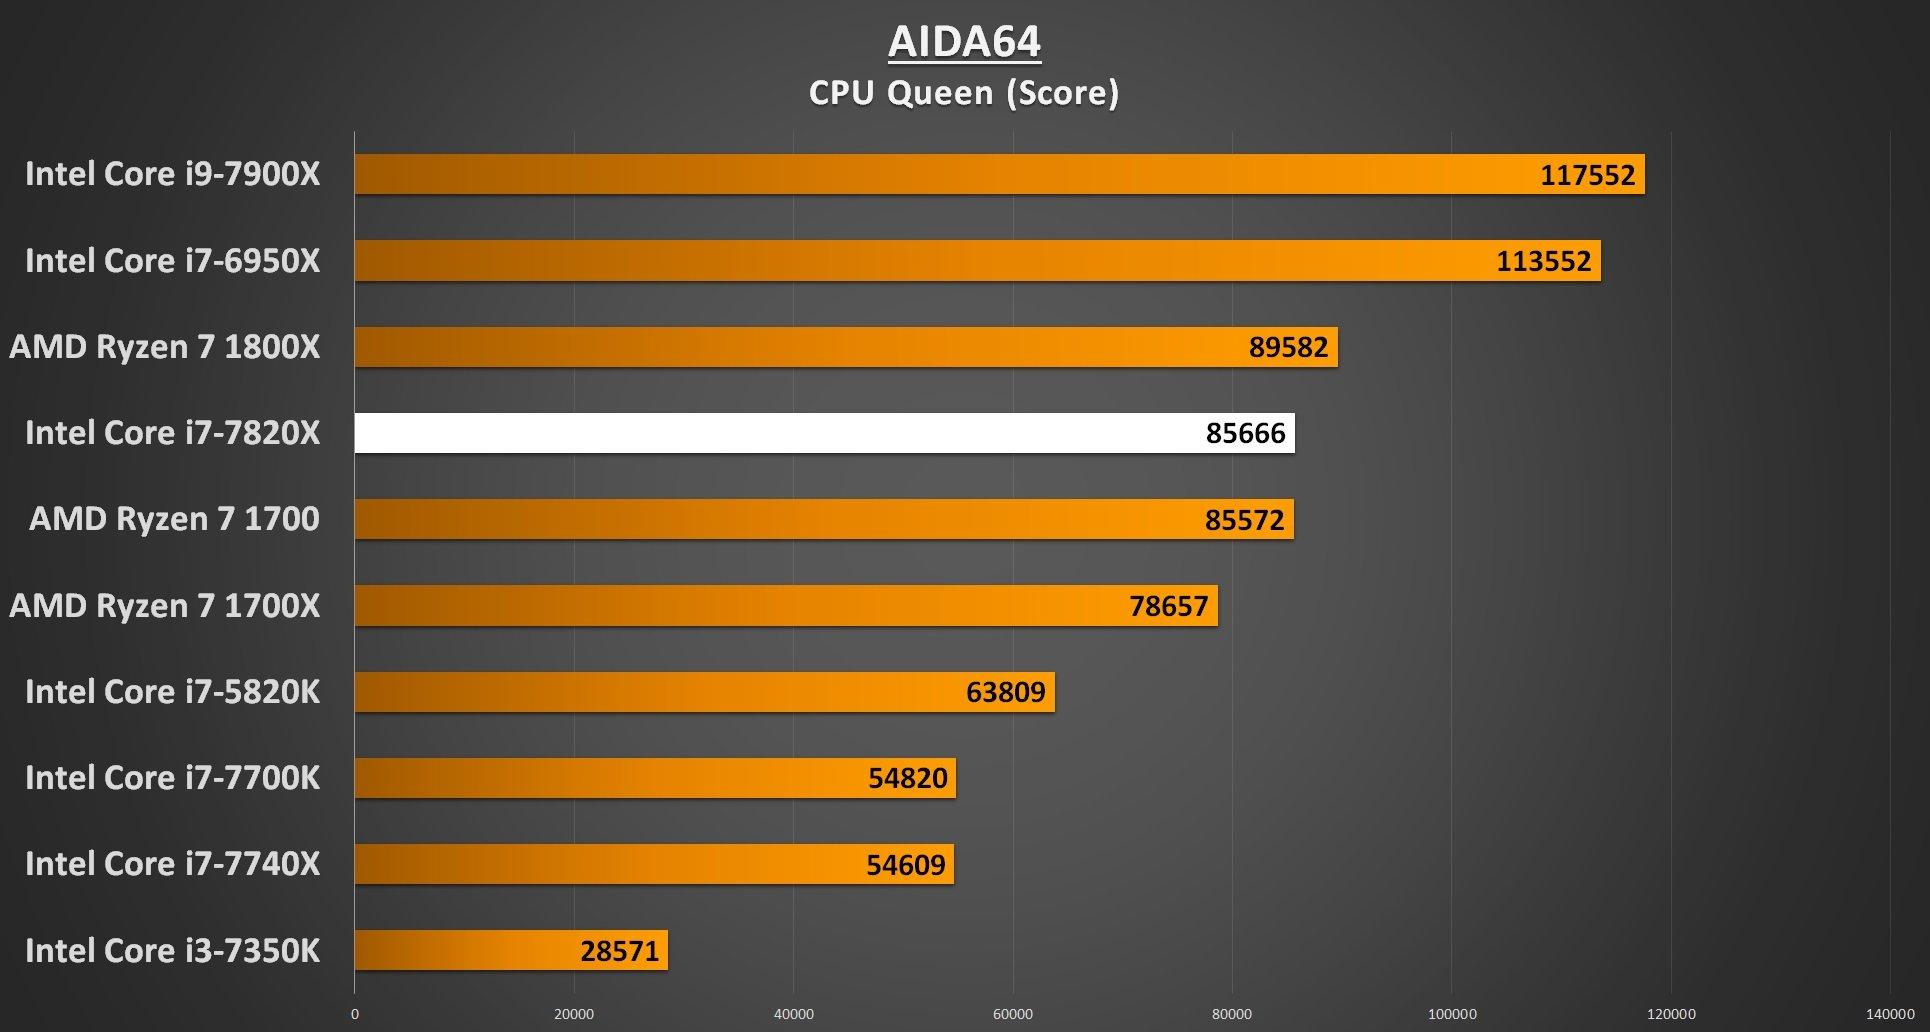 AIDA64 CPU QUEEN - i7-7820X Performance